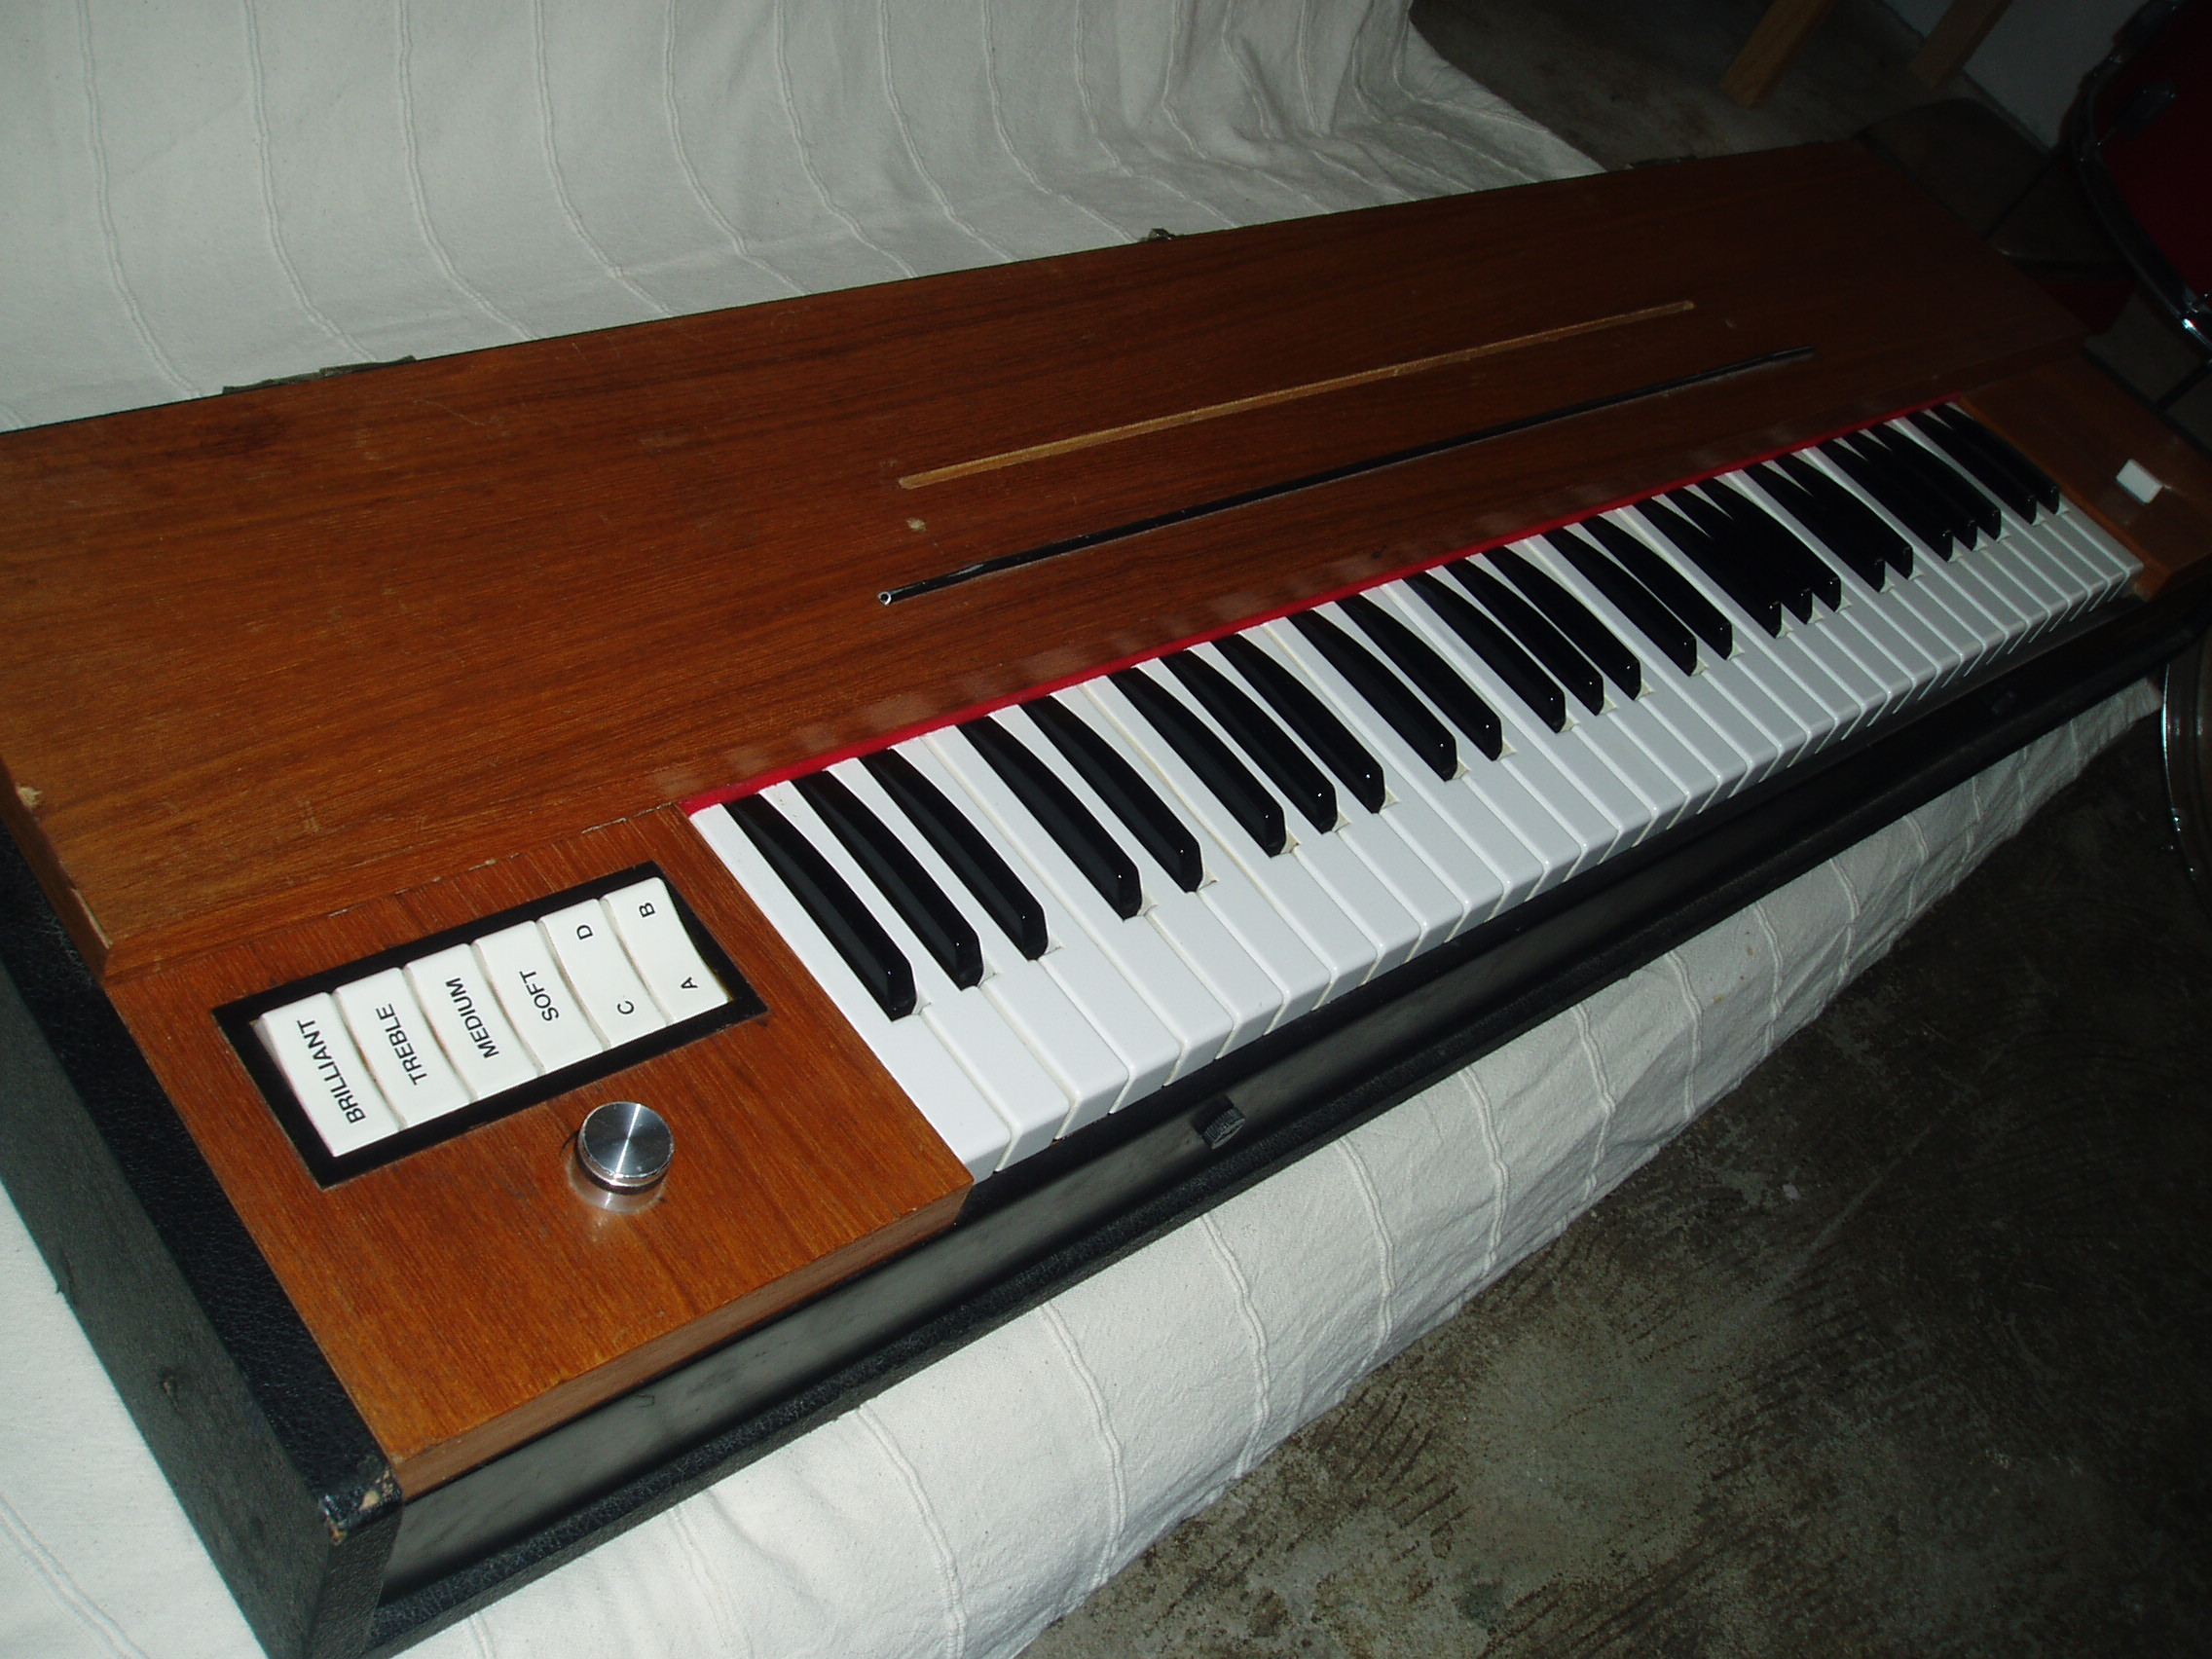 photo hohner clavinet d6 hohner clavinet d6 70858 255448 audiofanzine. Black Bedroom Furniture Sets. Home Design Ideas